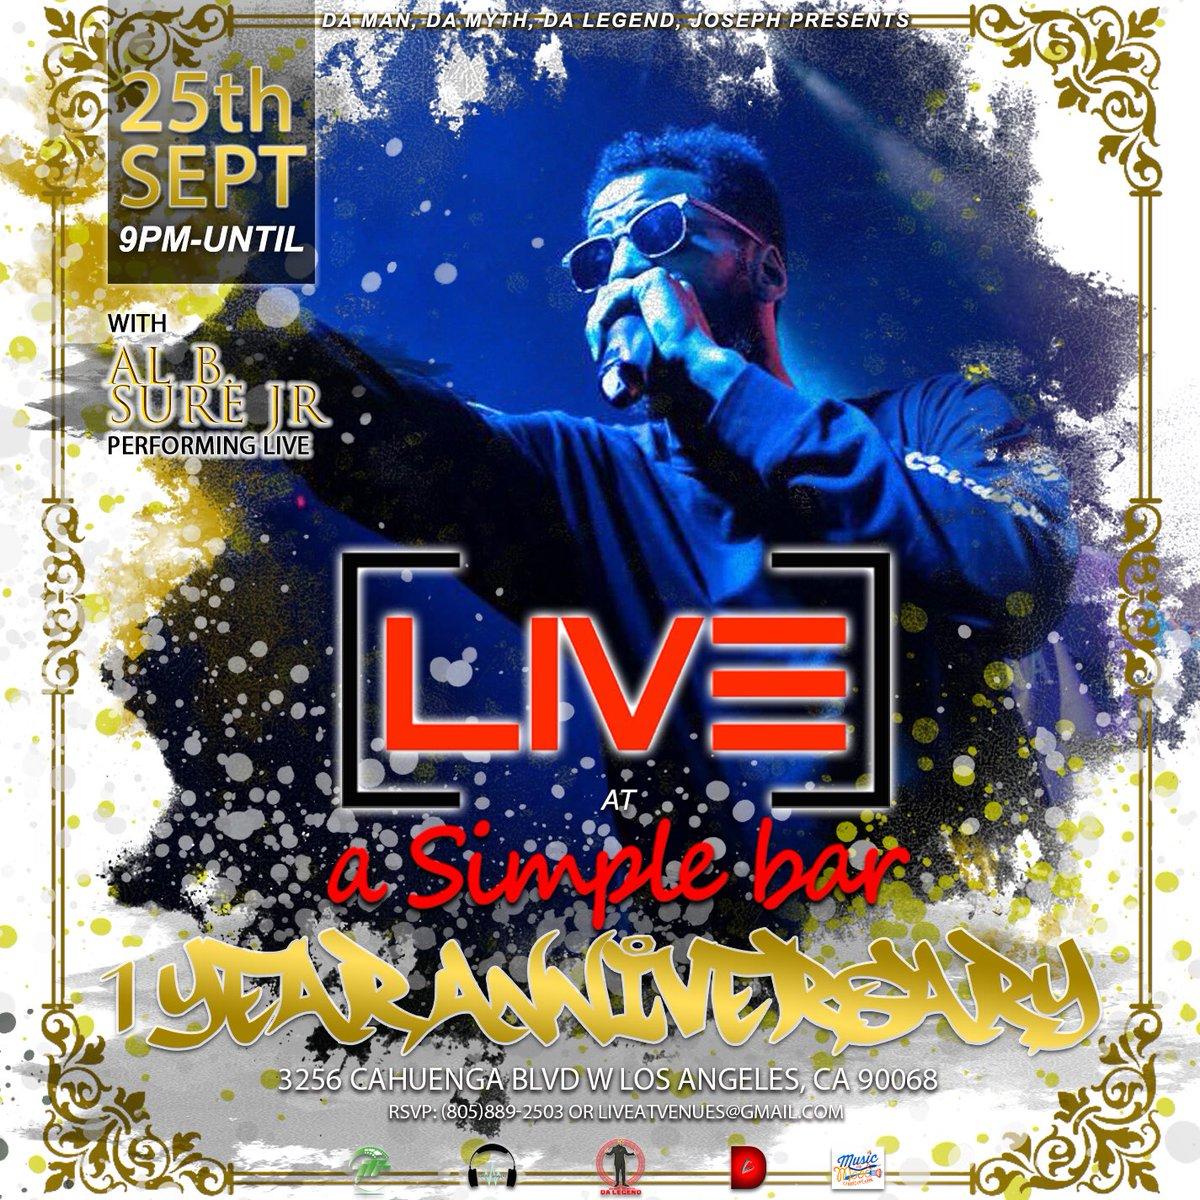 #LIVEatSimpleBar 1 Year #Anniversary #RedCarpet #Mixer #Show & #LIVE #Performance with #RecordingArtist @bsurealbjr, #Host #DaManDaMythDaLegendJoseph, @NoritaBango, @donbgotdabeats & #FoodTruck also a #Surprise #DJ #Spinning #Wednesday #September #25th #9pm to #2am @asimplebar